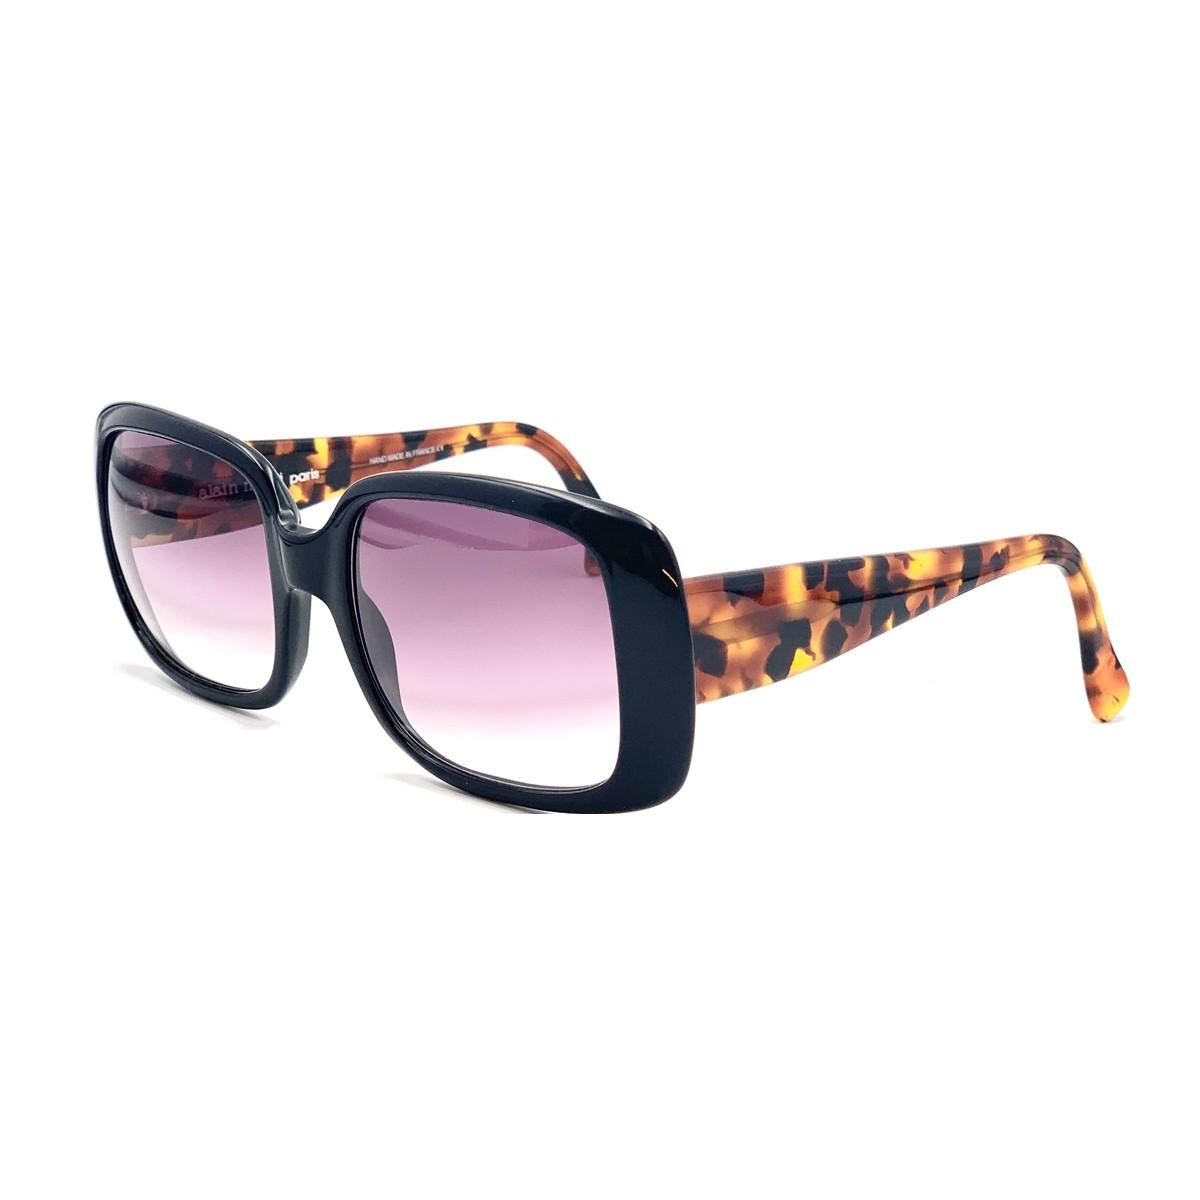 Alain Mikli AL3183 | Women's sunglasses